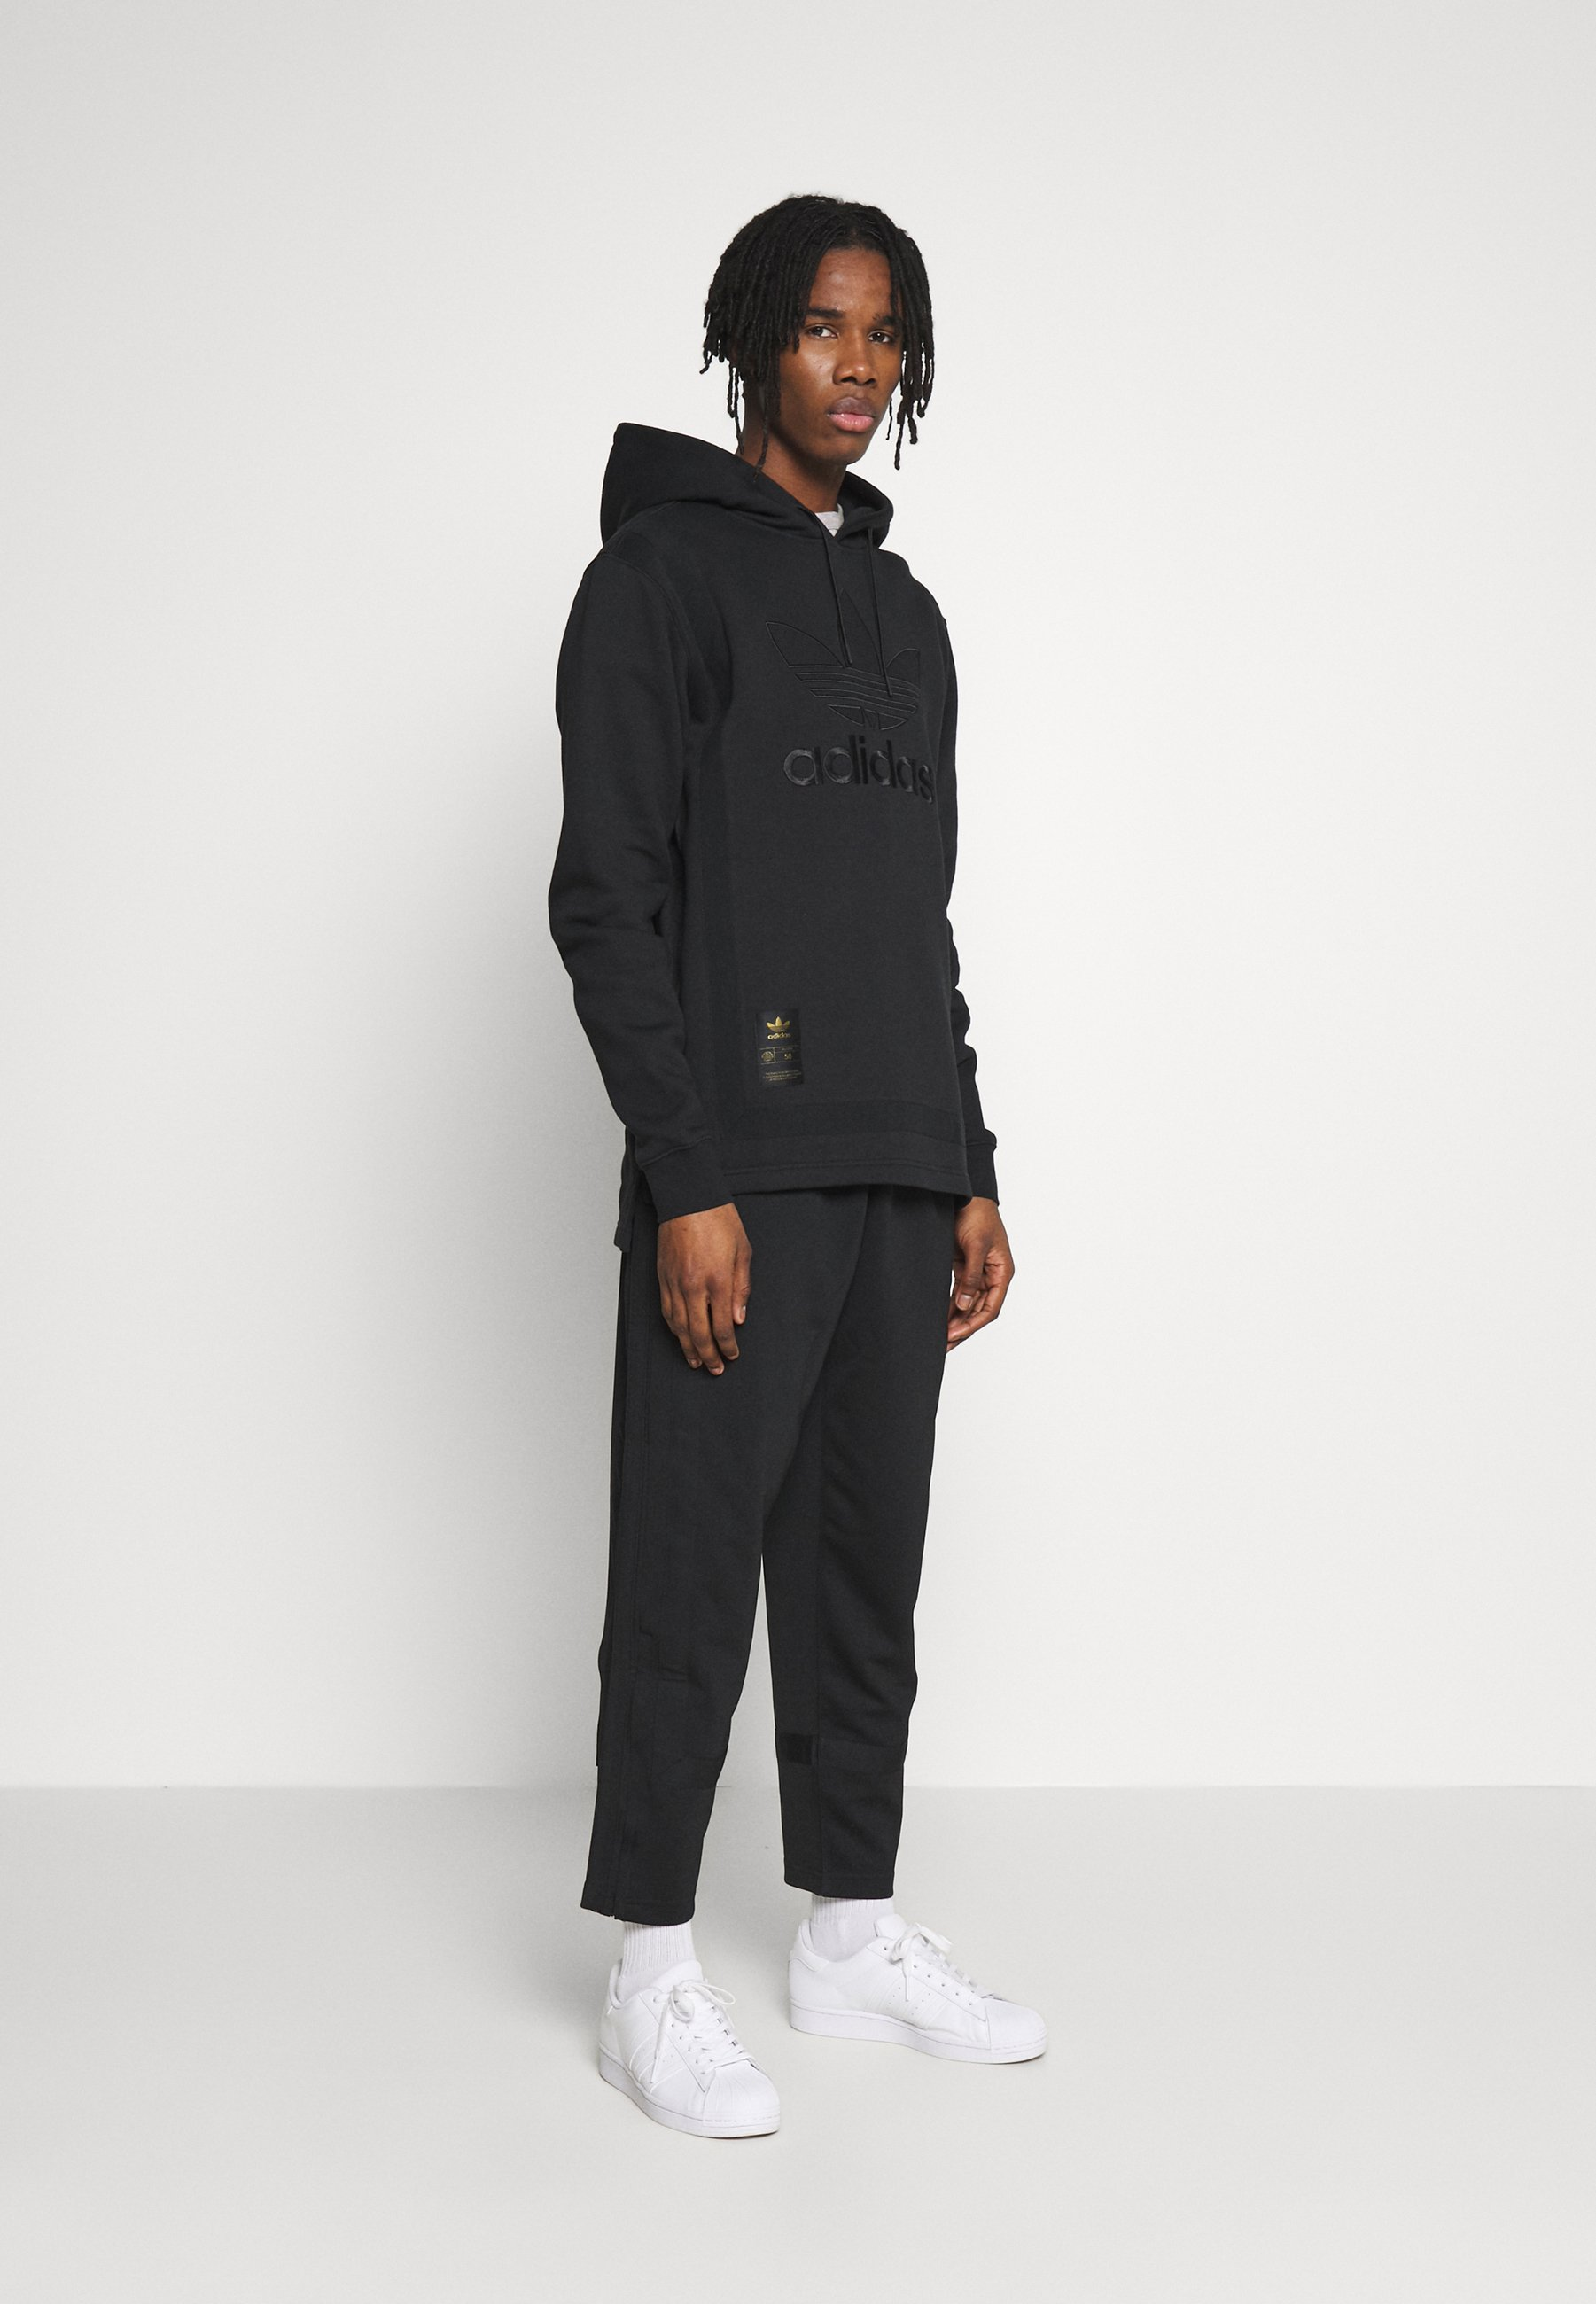 Adidas Originals Warmup - Joggebukse Black